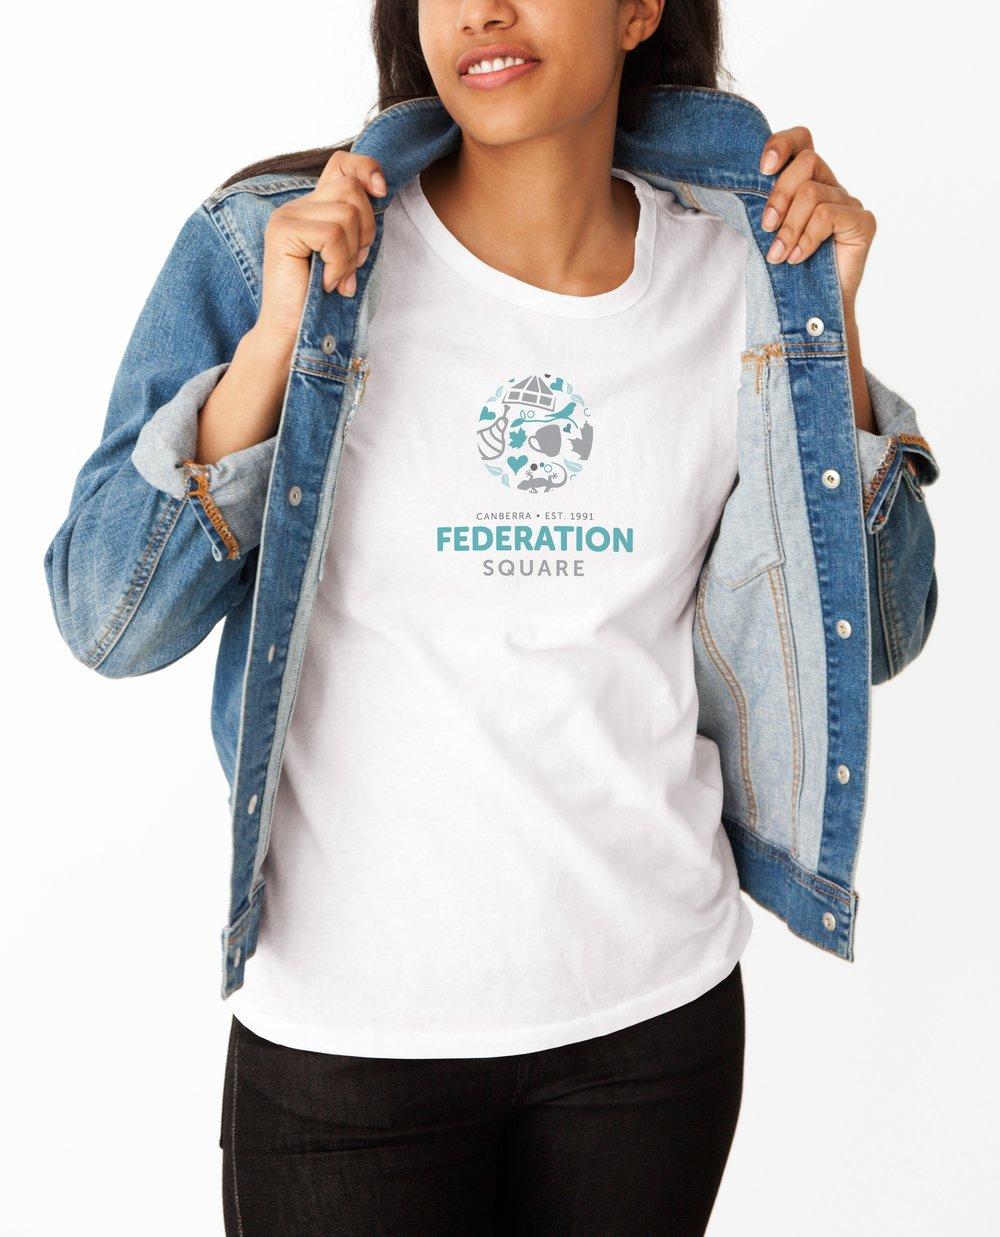 Shirt 0539-1 2018-12-07.jpeg